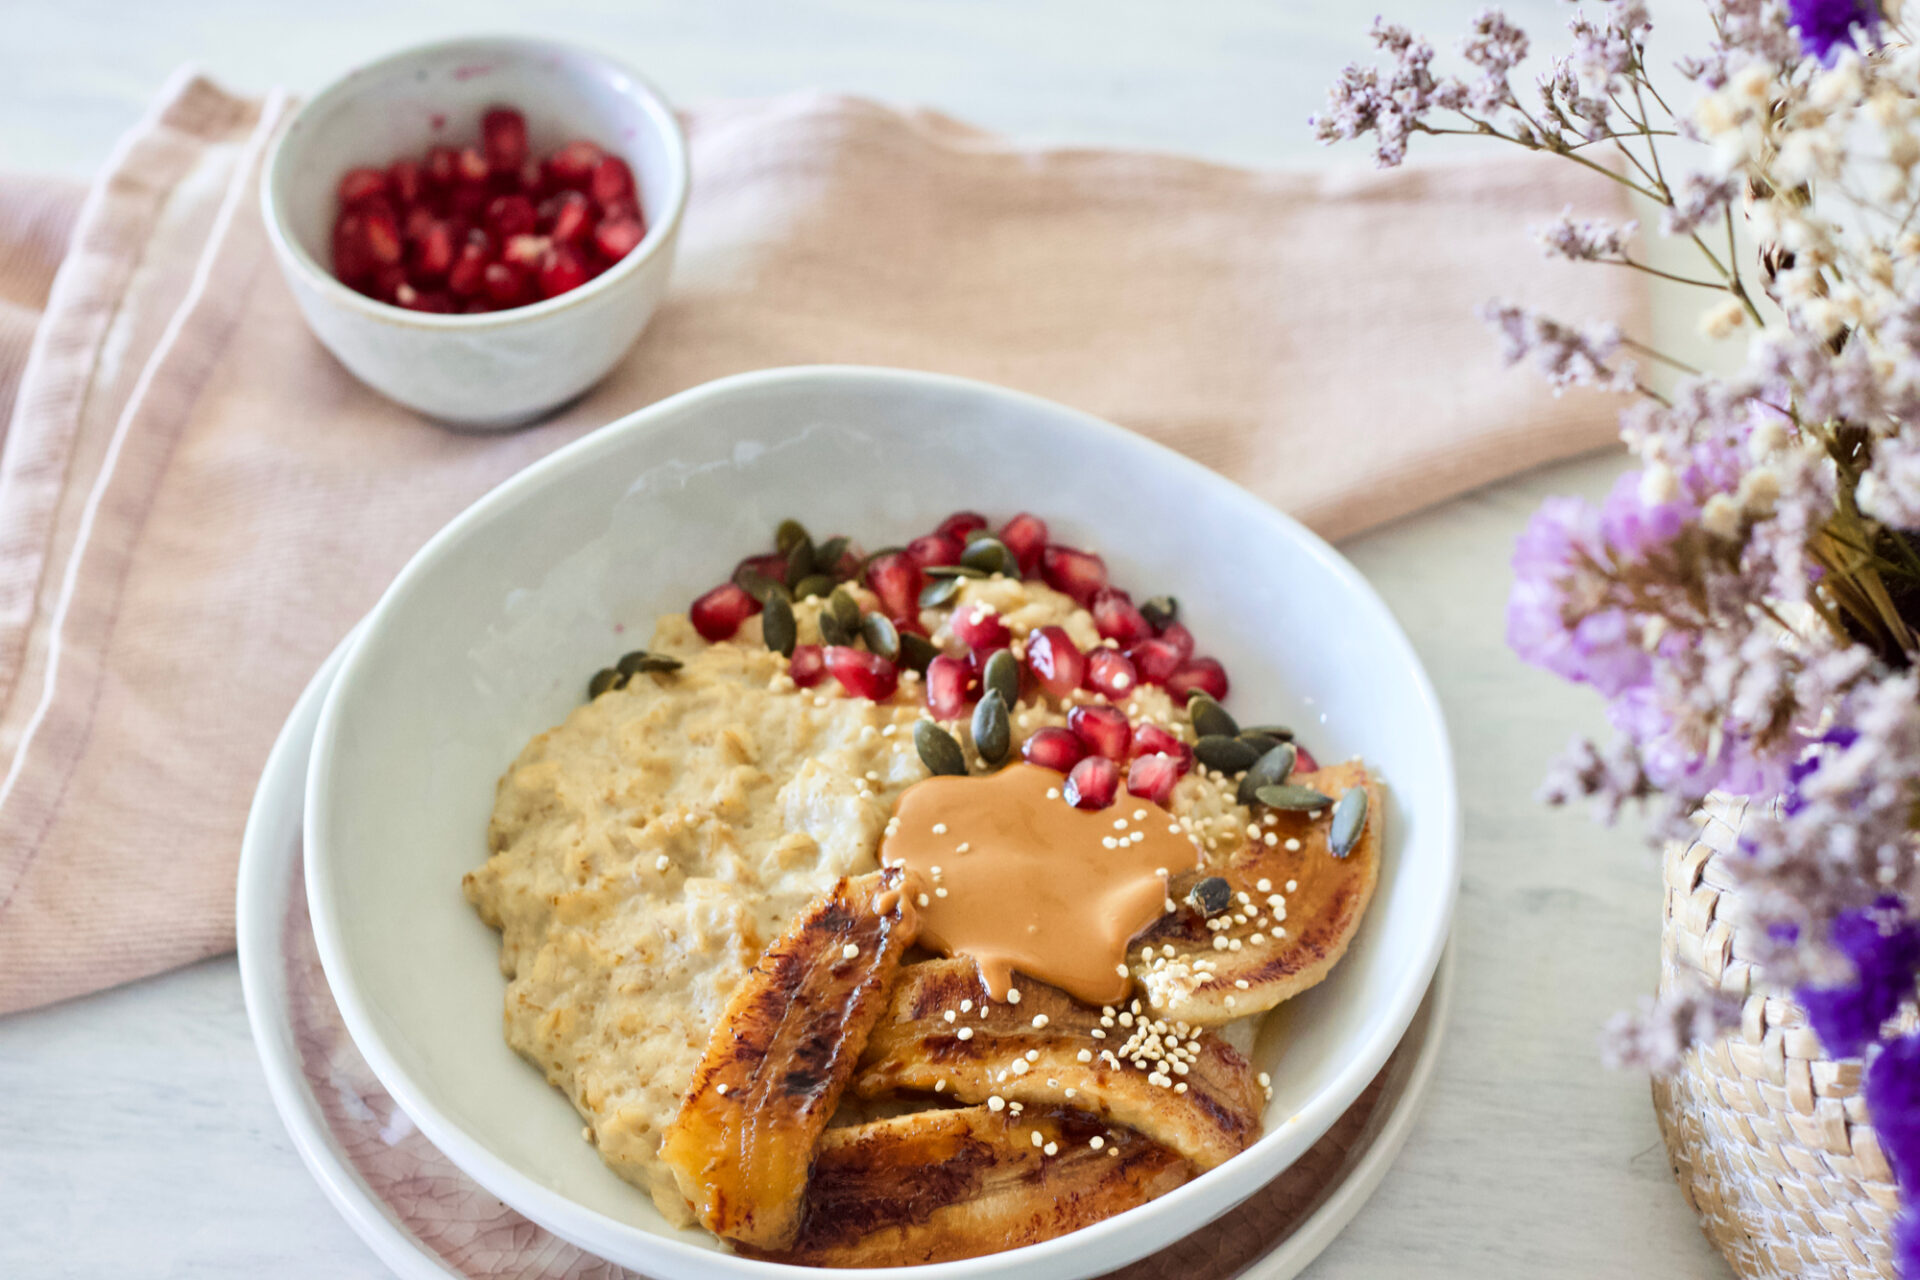 healthy-vegan-breakfast-caramelized-Banana-Oatmeal-saudável-aveia-banana-caramelizada-3